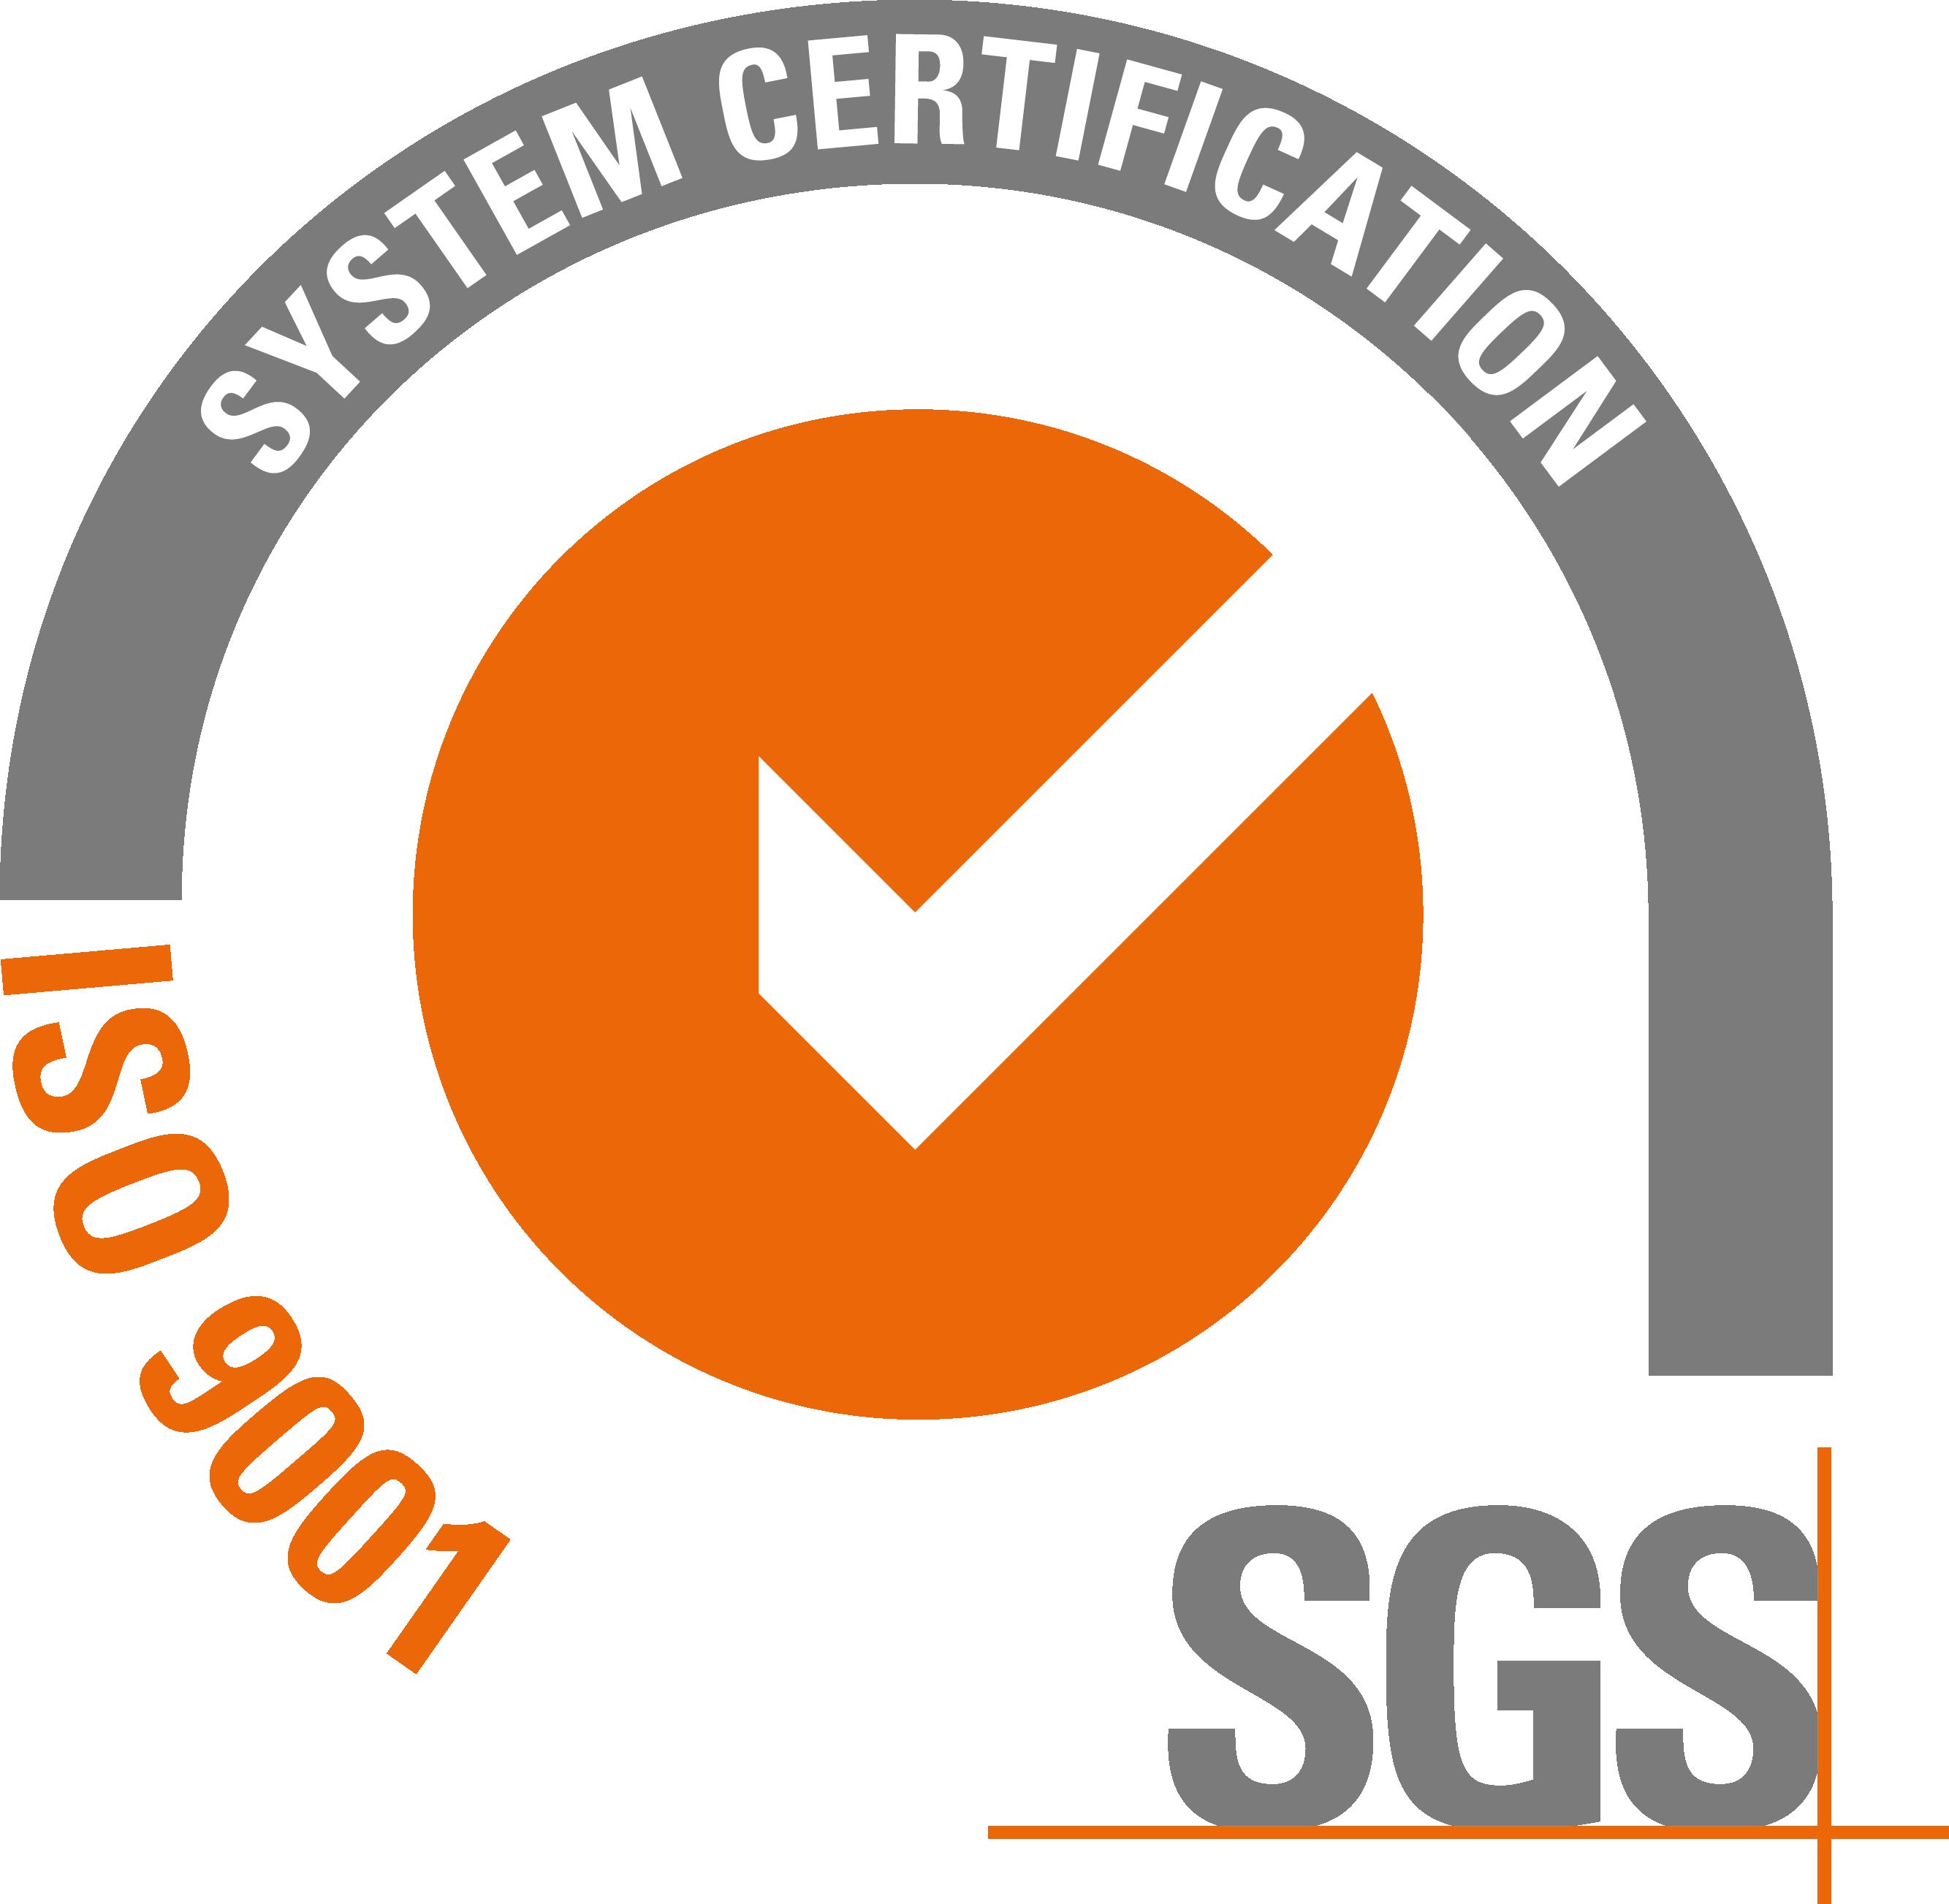 Davis-Standard's Pawcatuck Facility Achieves ISO Certification -  Davis-Standard